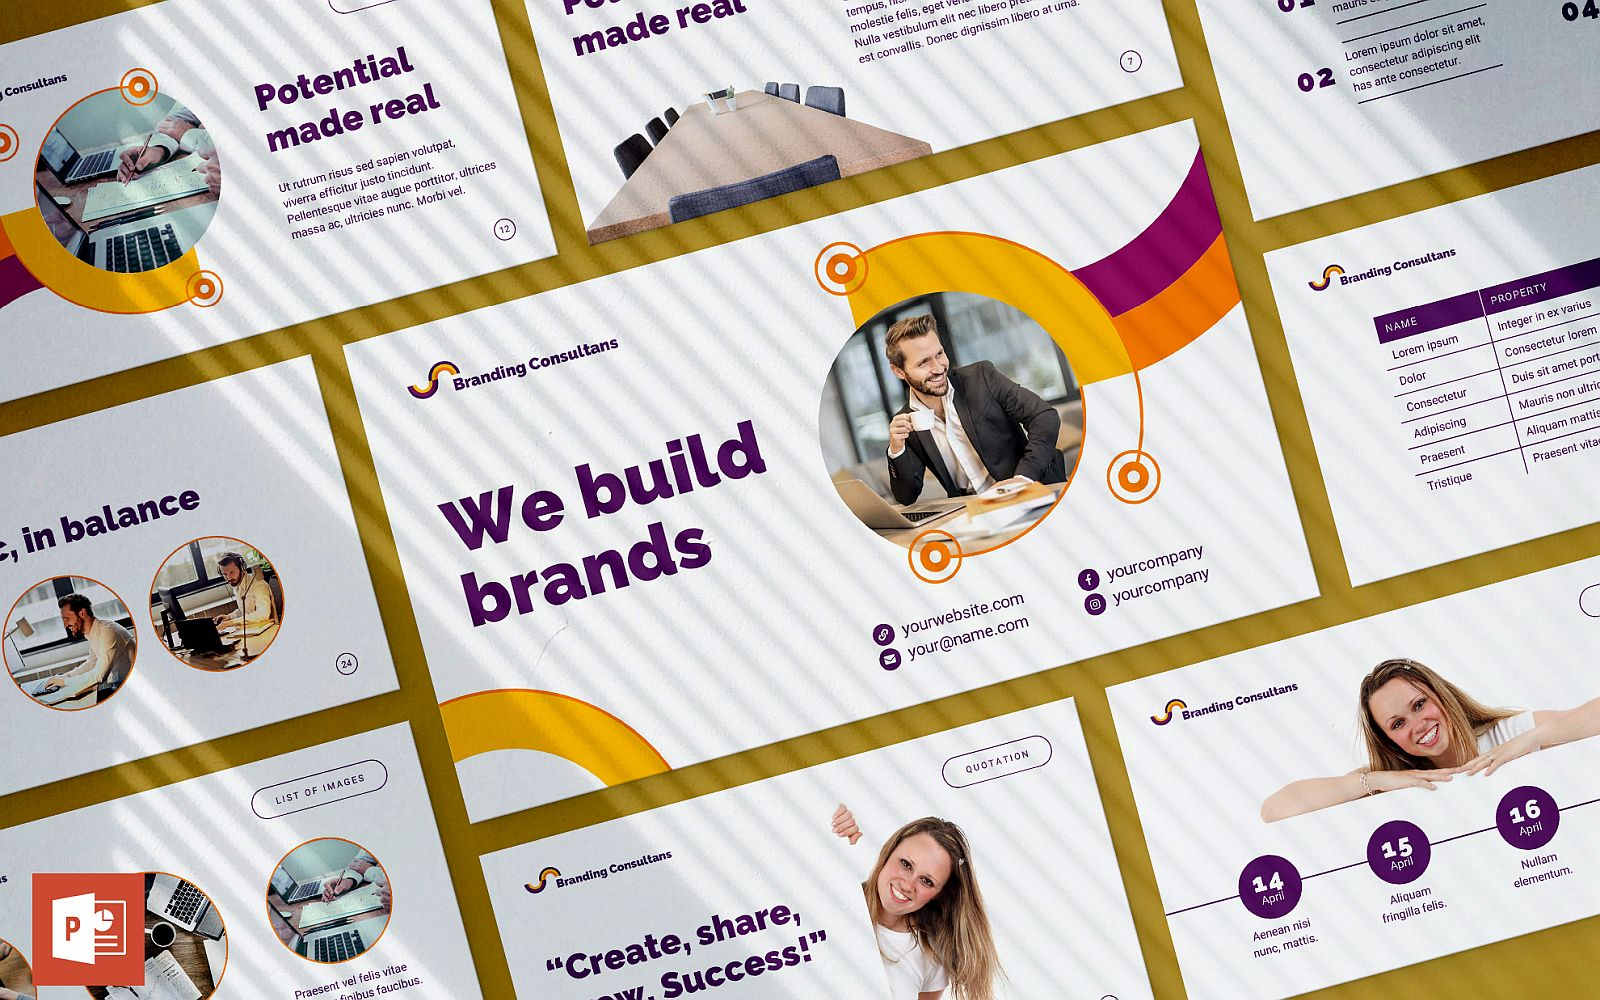 Branding Consultant Presentation PowerPoint Template